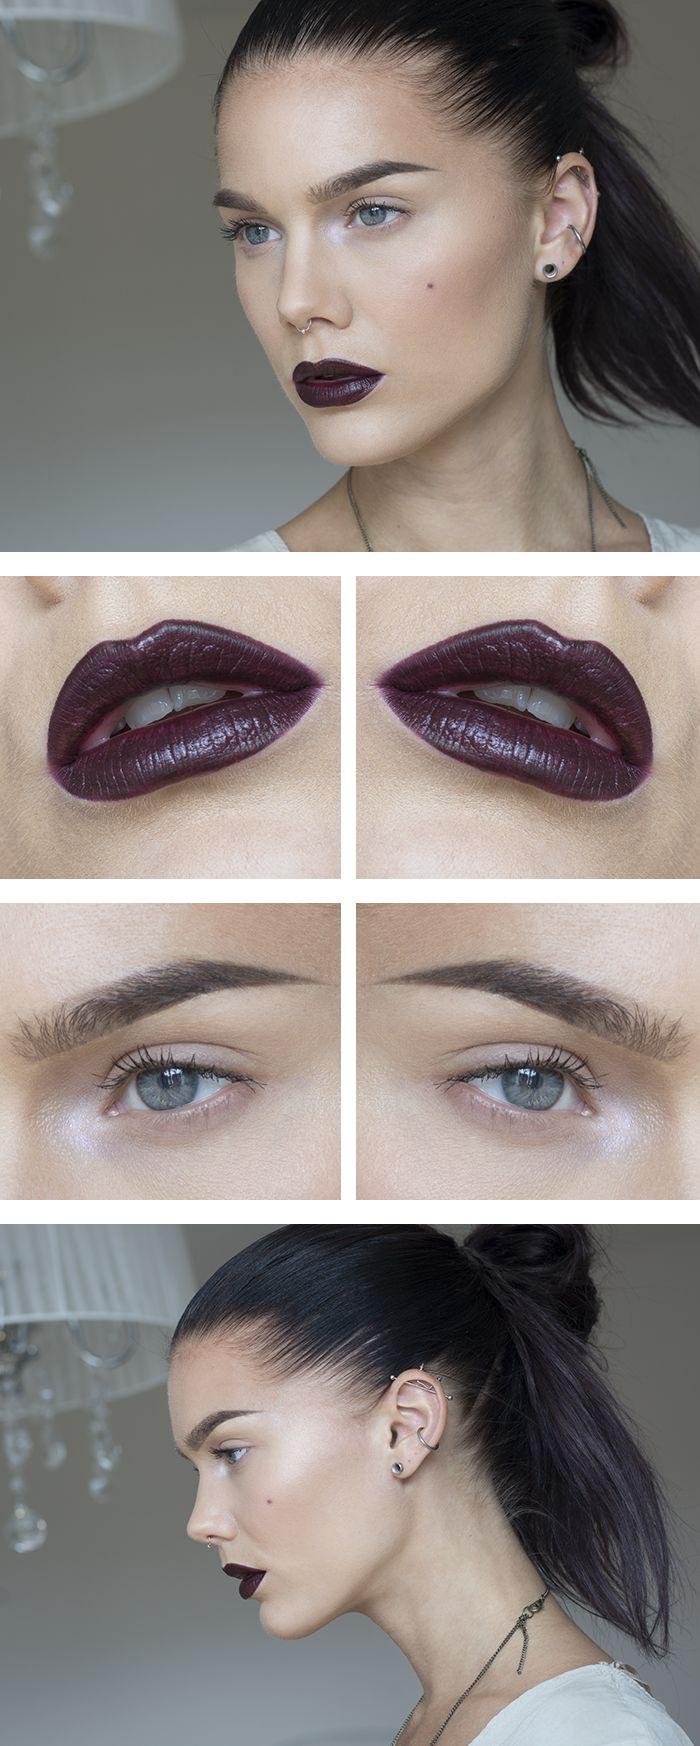 Jag har använt/I've used Da vinci mineral eyeshadow